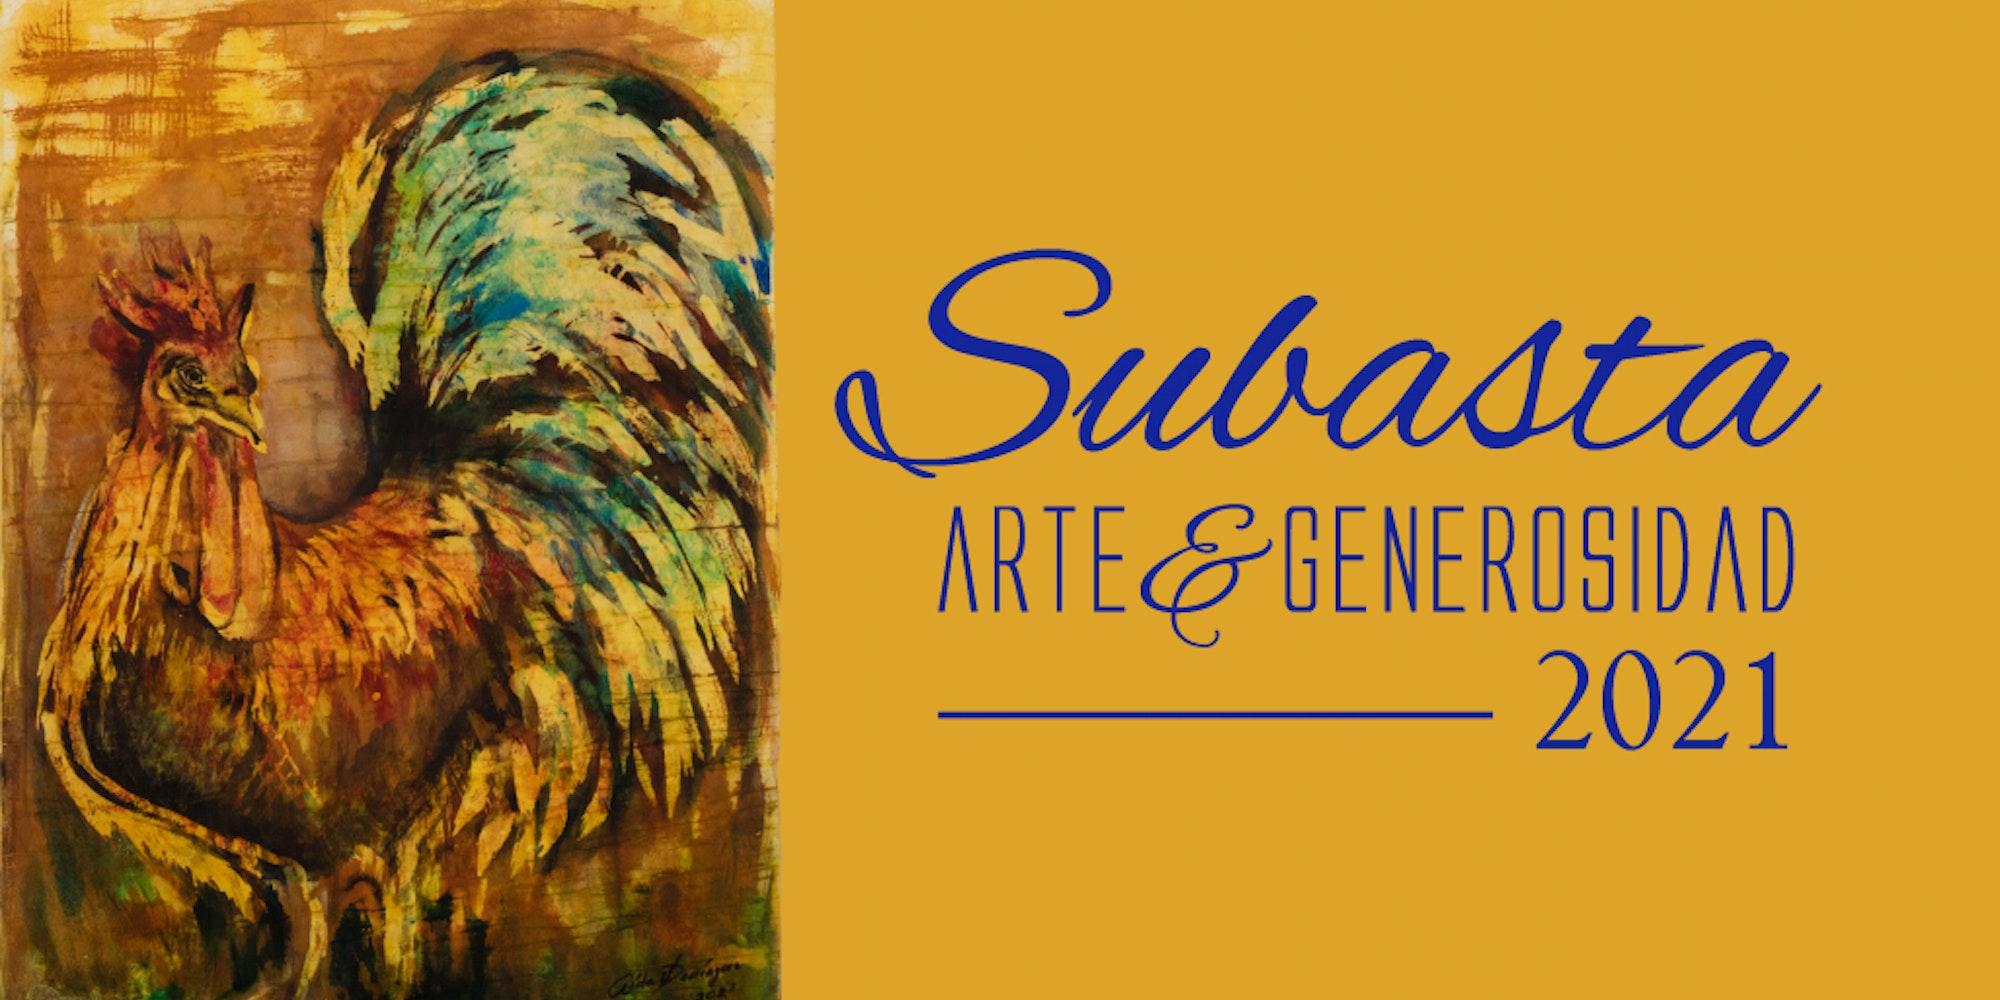 Cover Image for ¡Se acerca la Subasta Arte & Generosidad 2021!